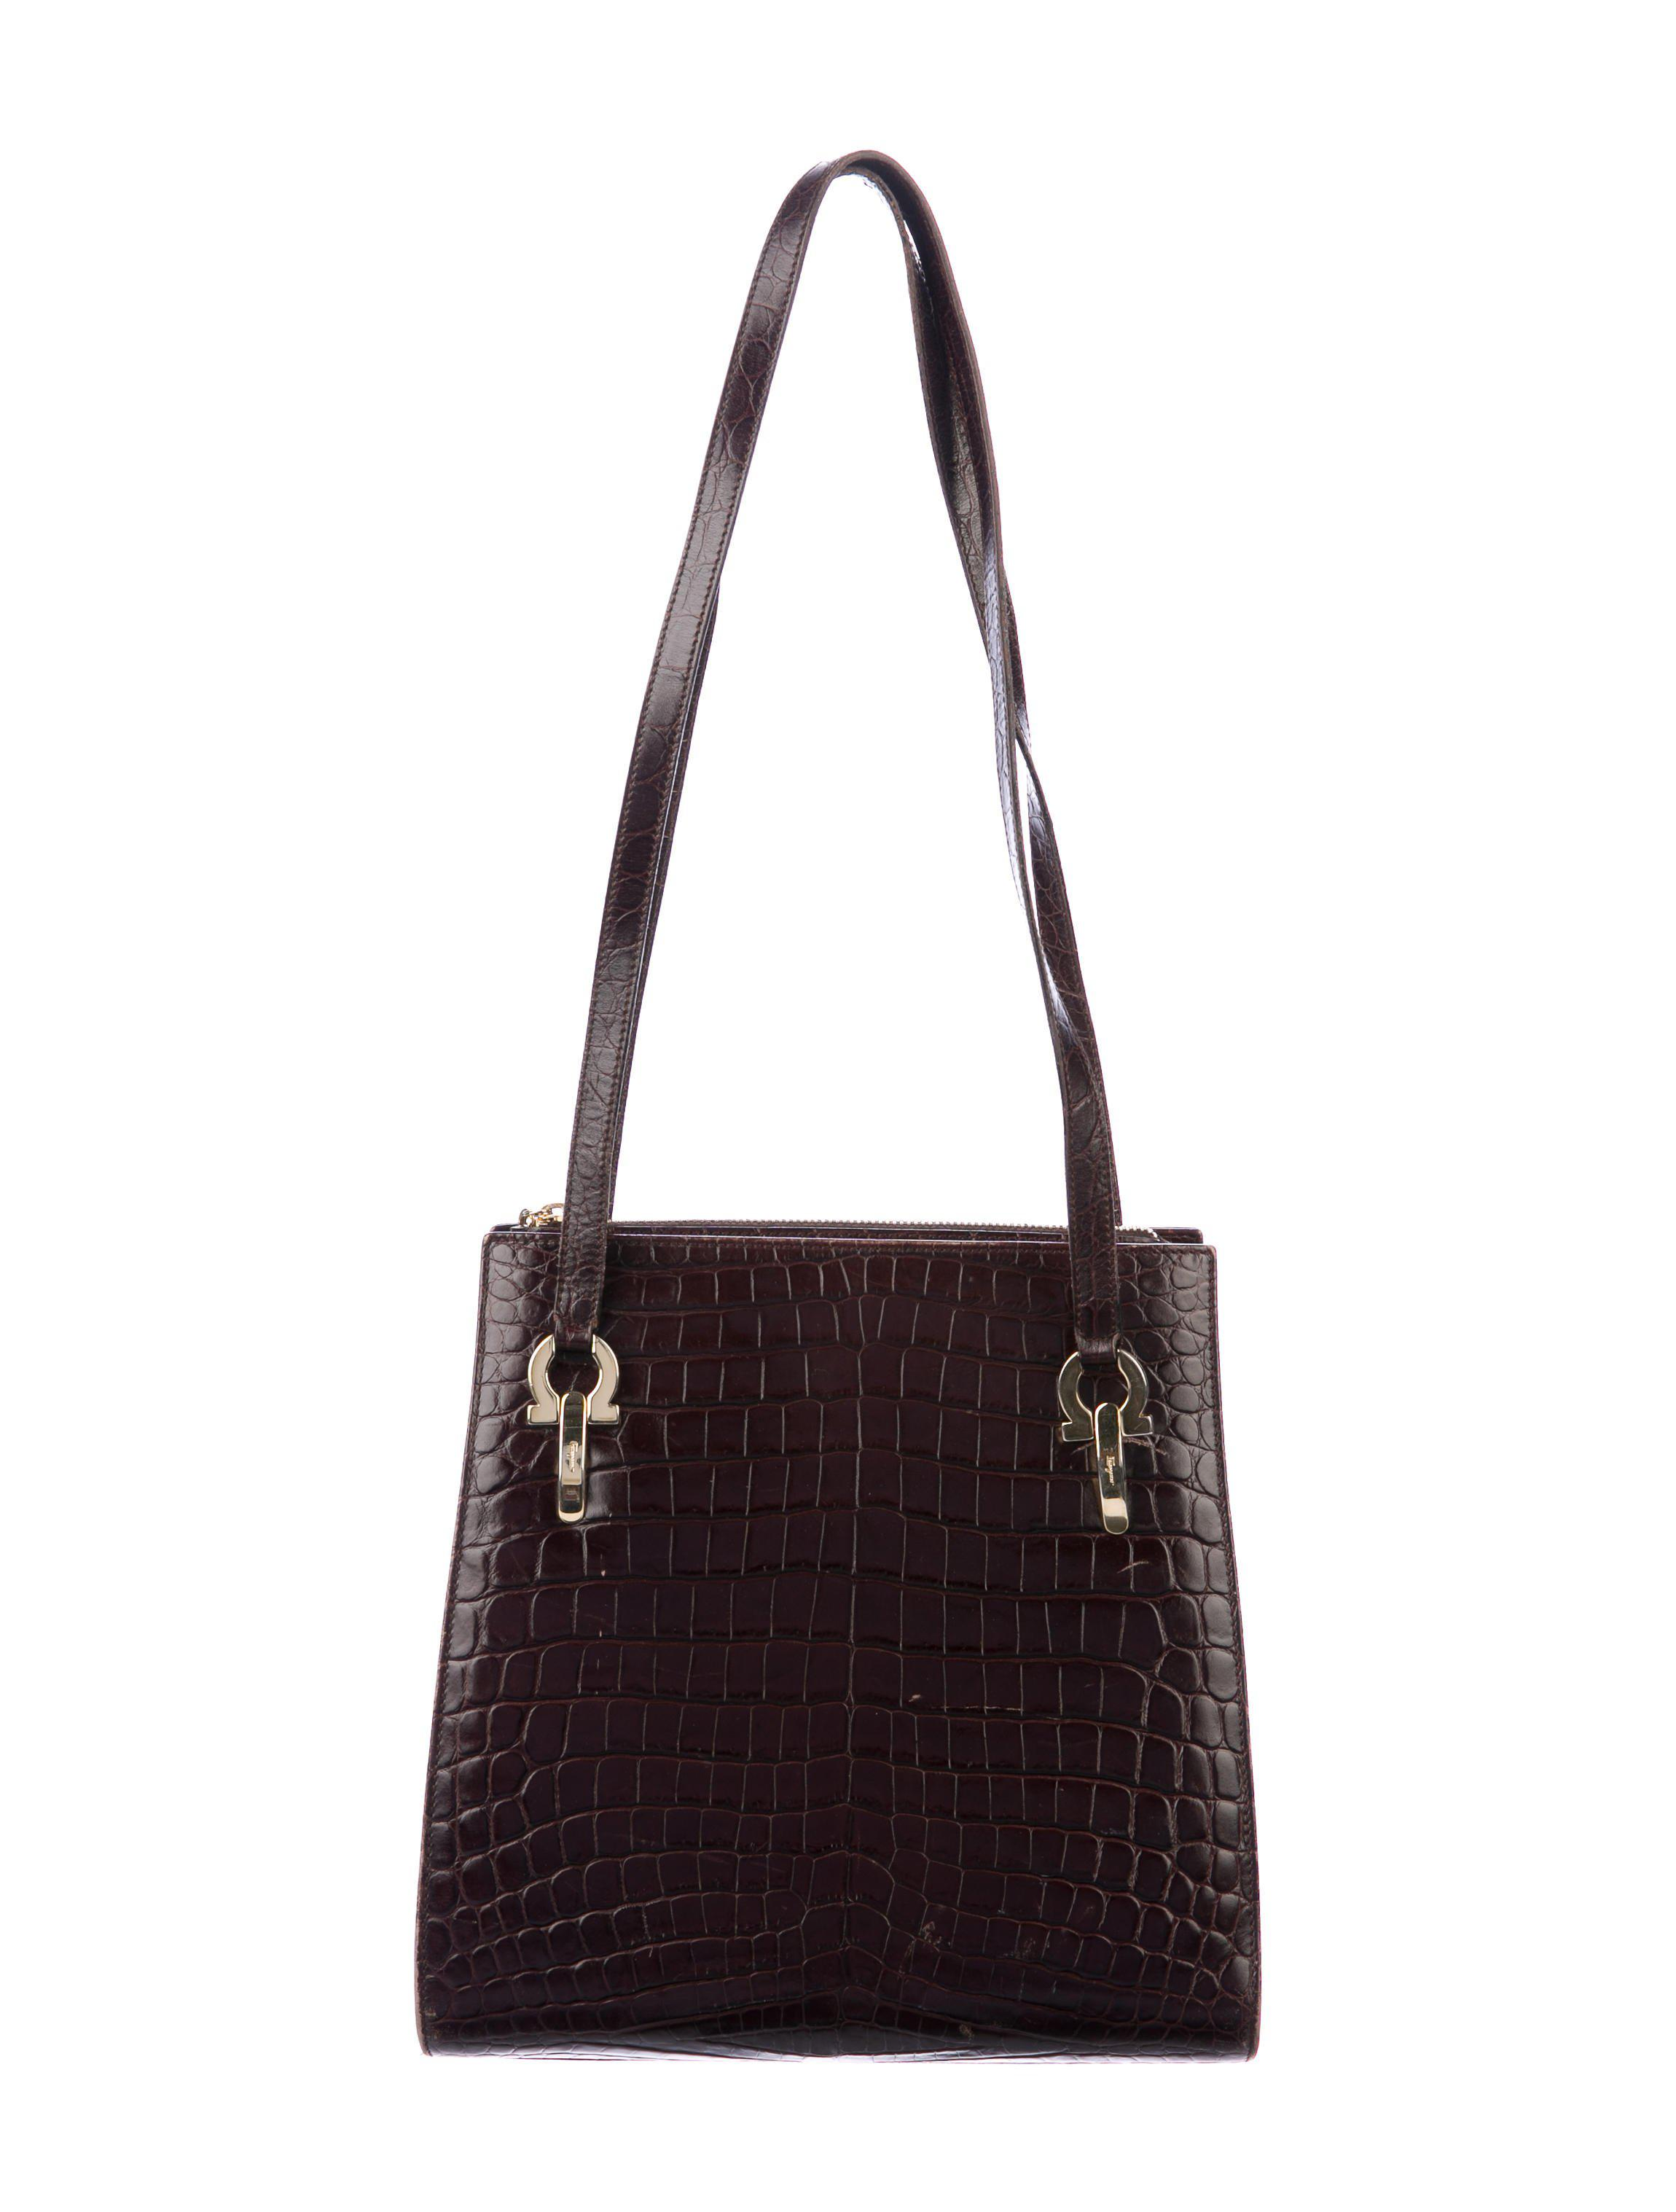 Lyst - Ferragamo Embossed Leather Shoulder Bag Gold in Metallic 6f324b314ca82